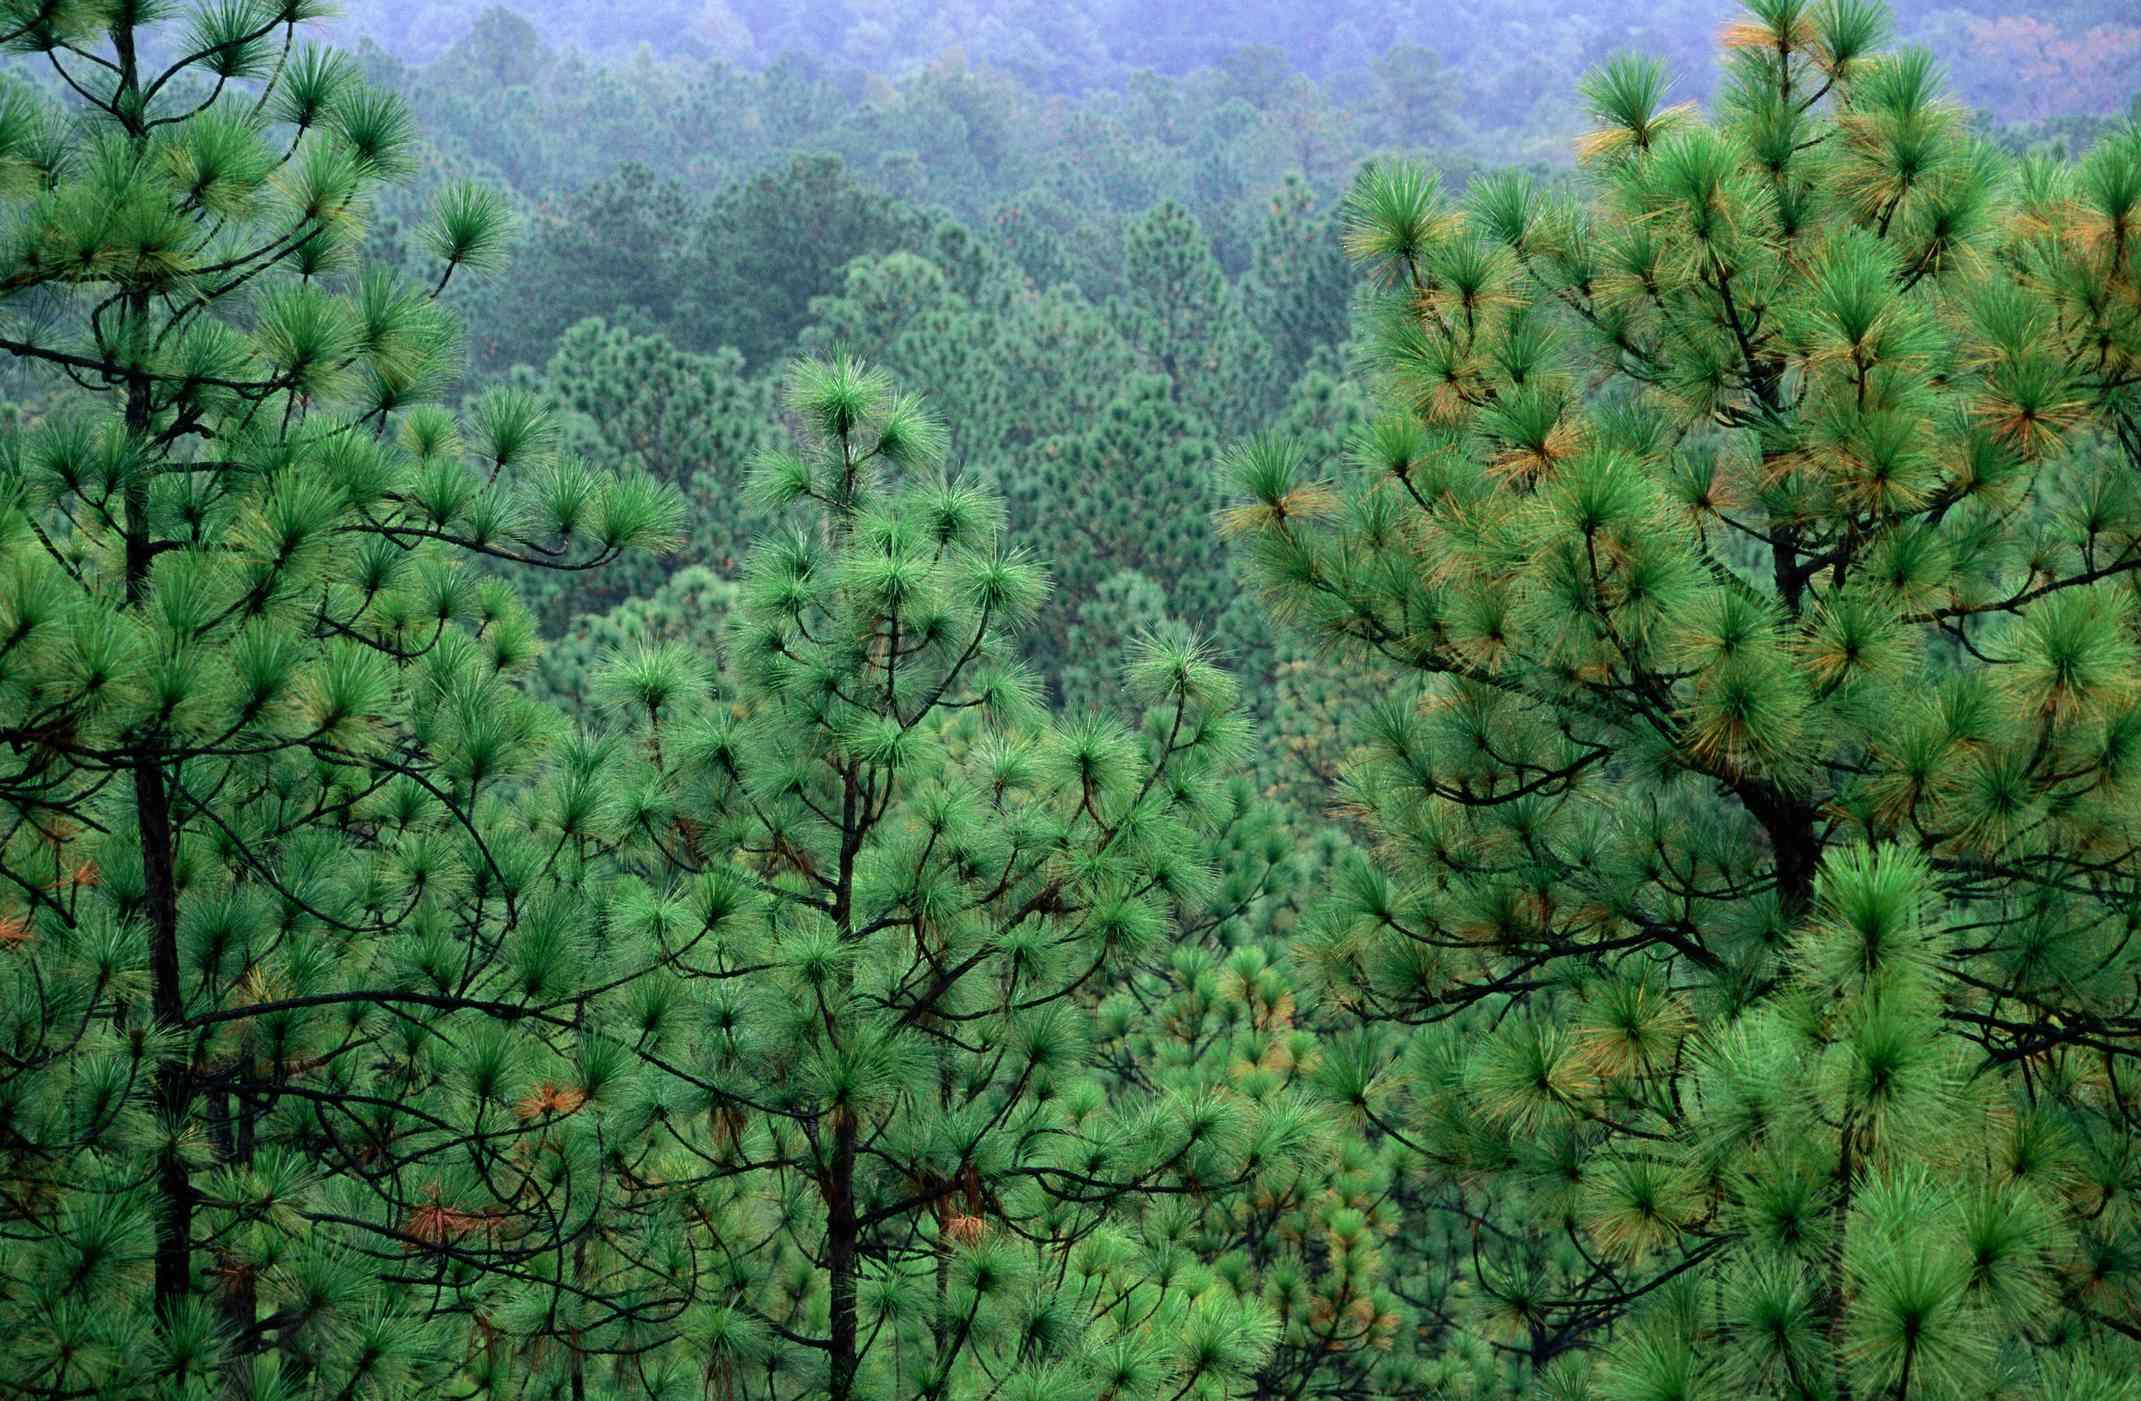 Longleaf pine forest.